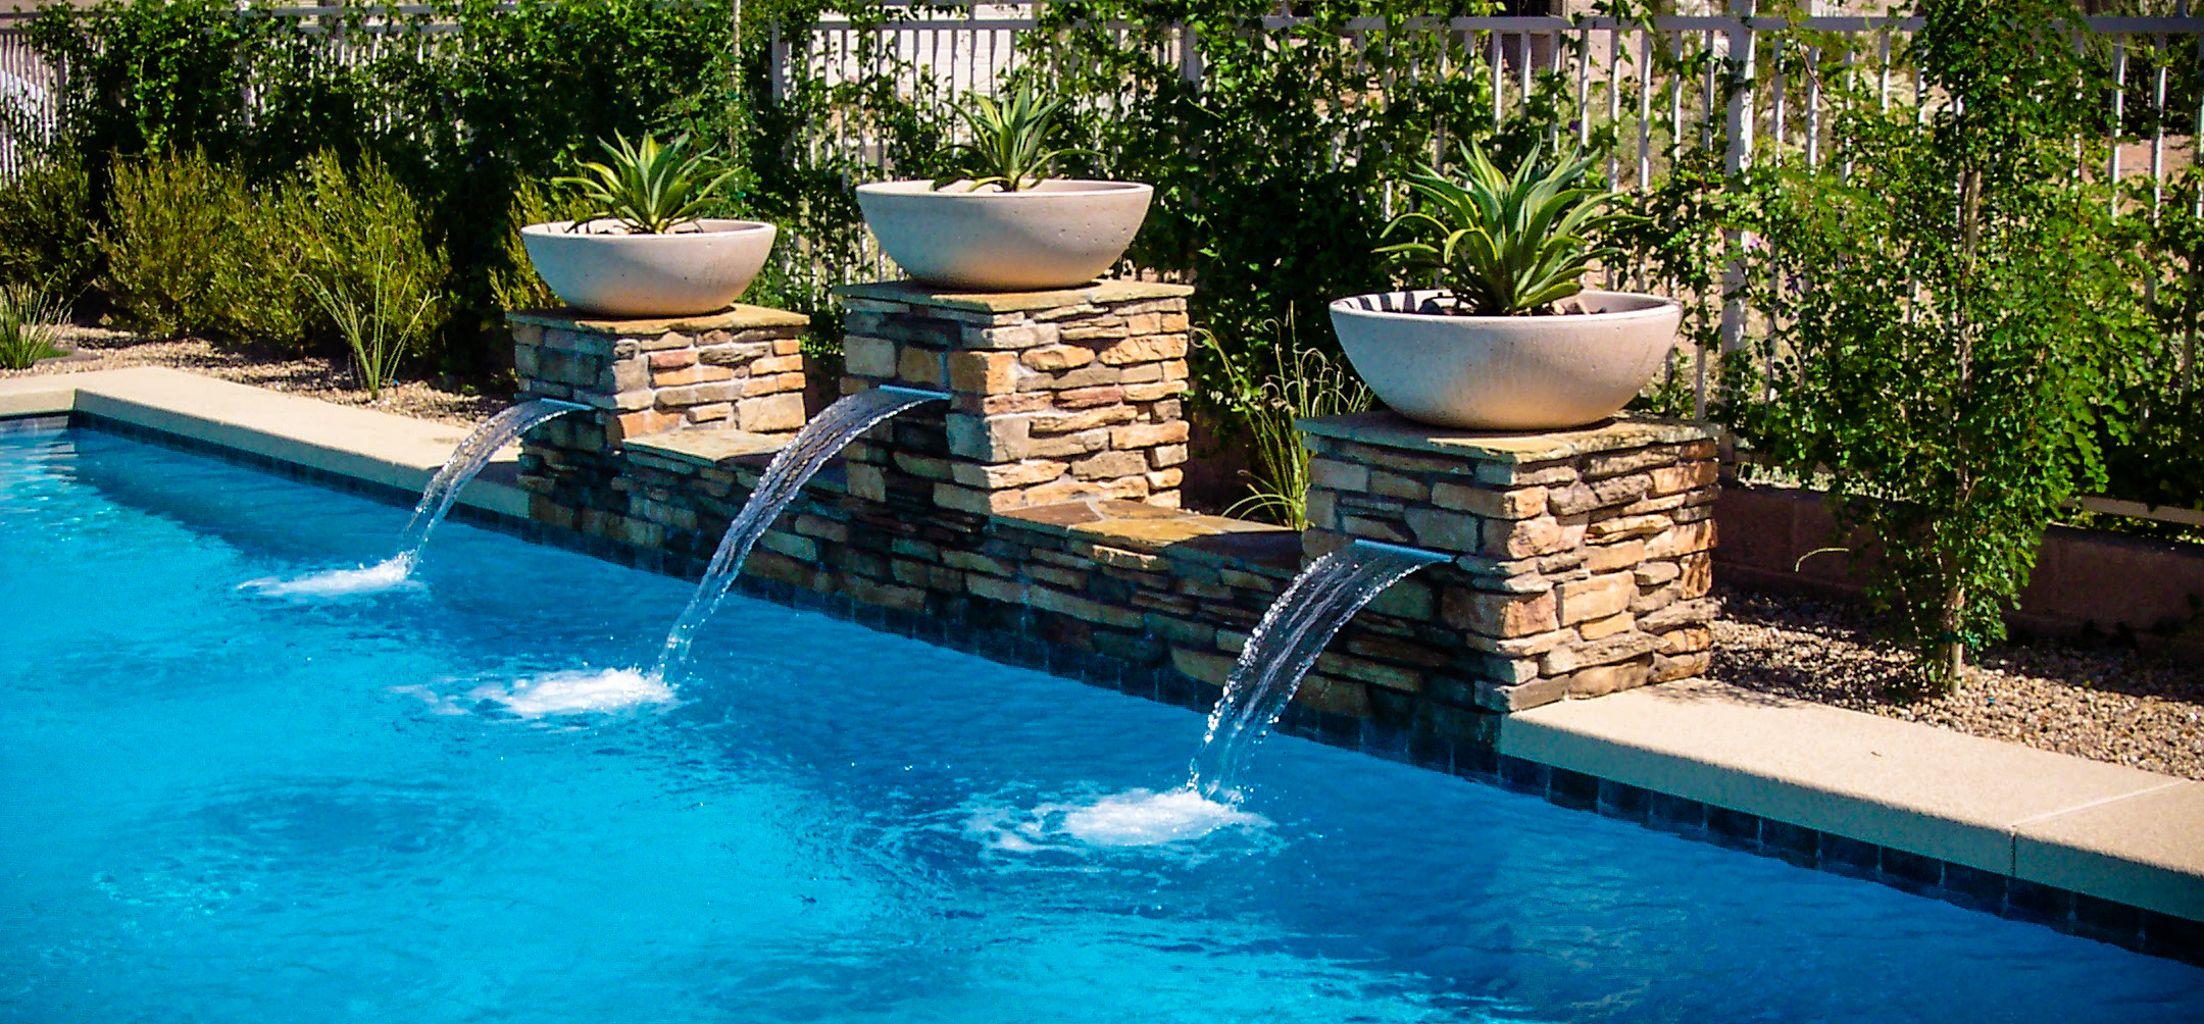 Sheer Descents Wok Pots Stacked Stone Pillars Phoenix Az Our Pools Pool Builders Pool